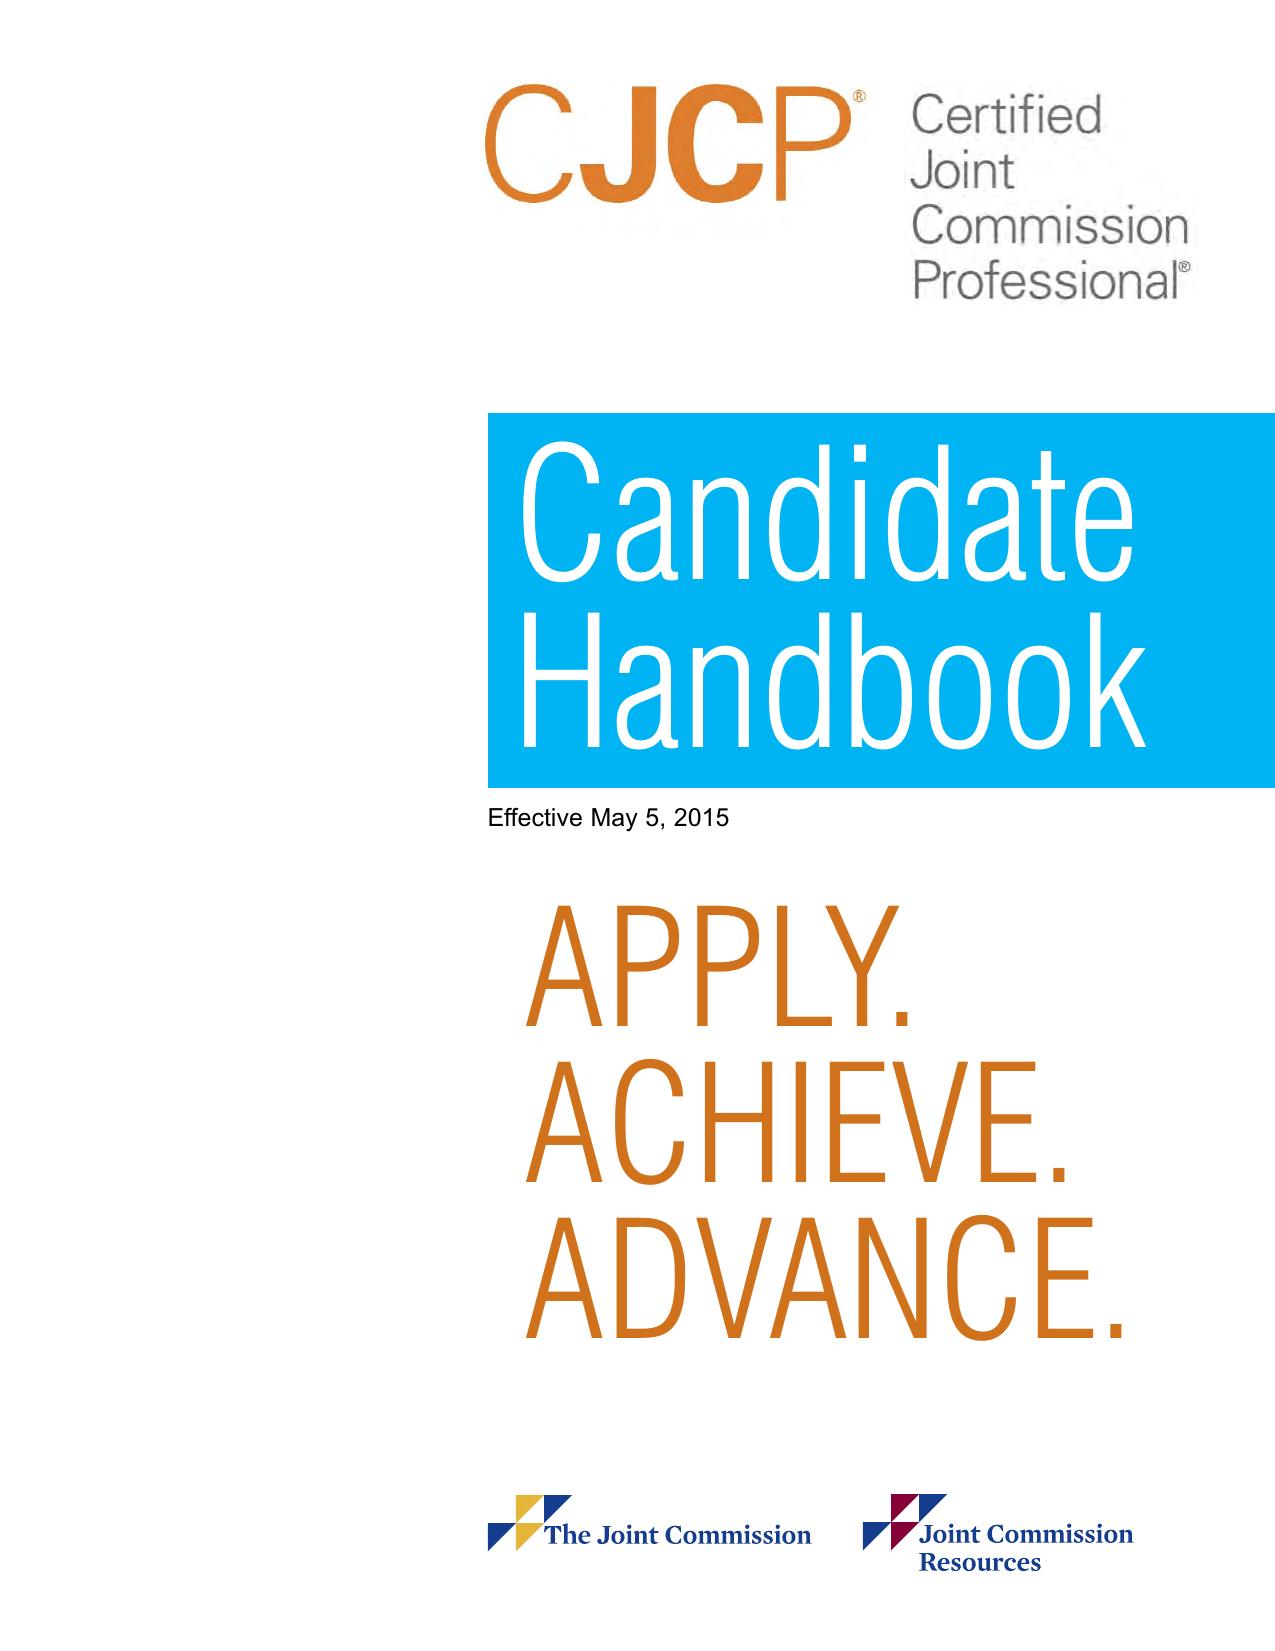 Cjcp Candidate Handbook